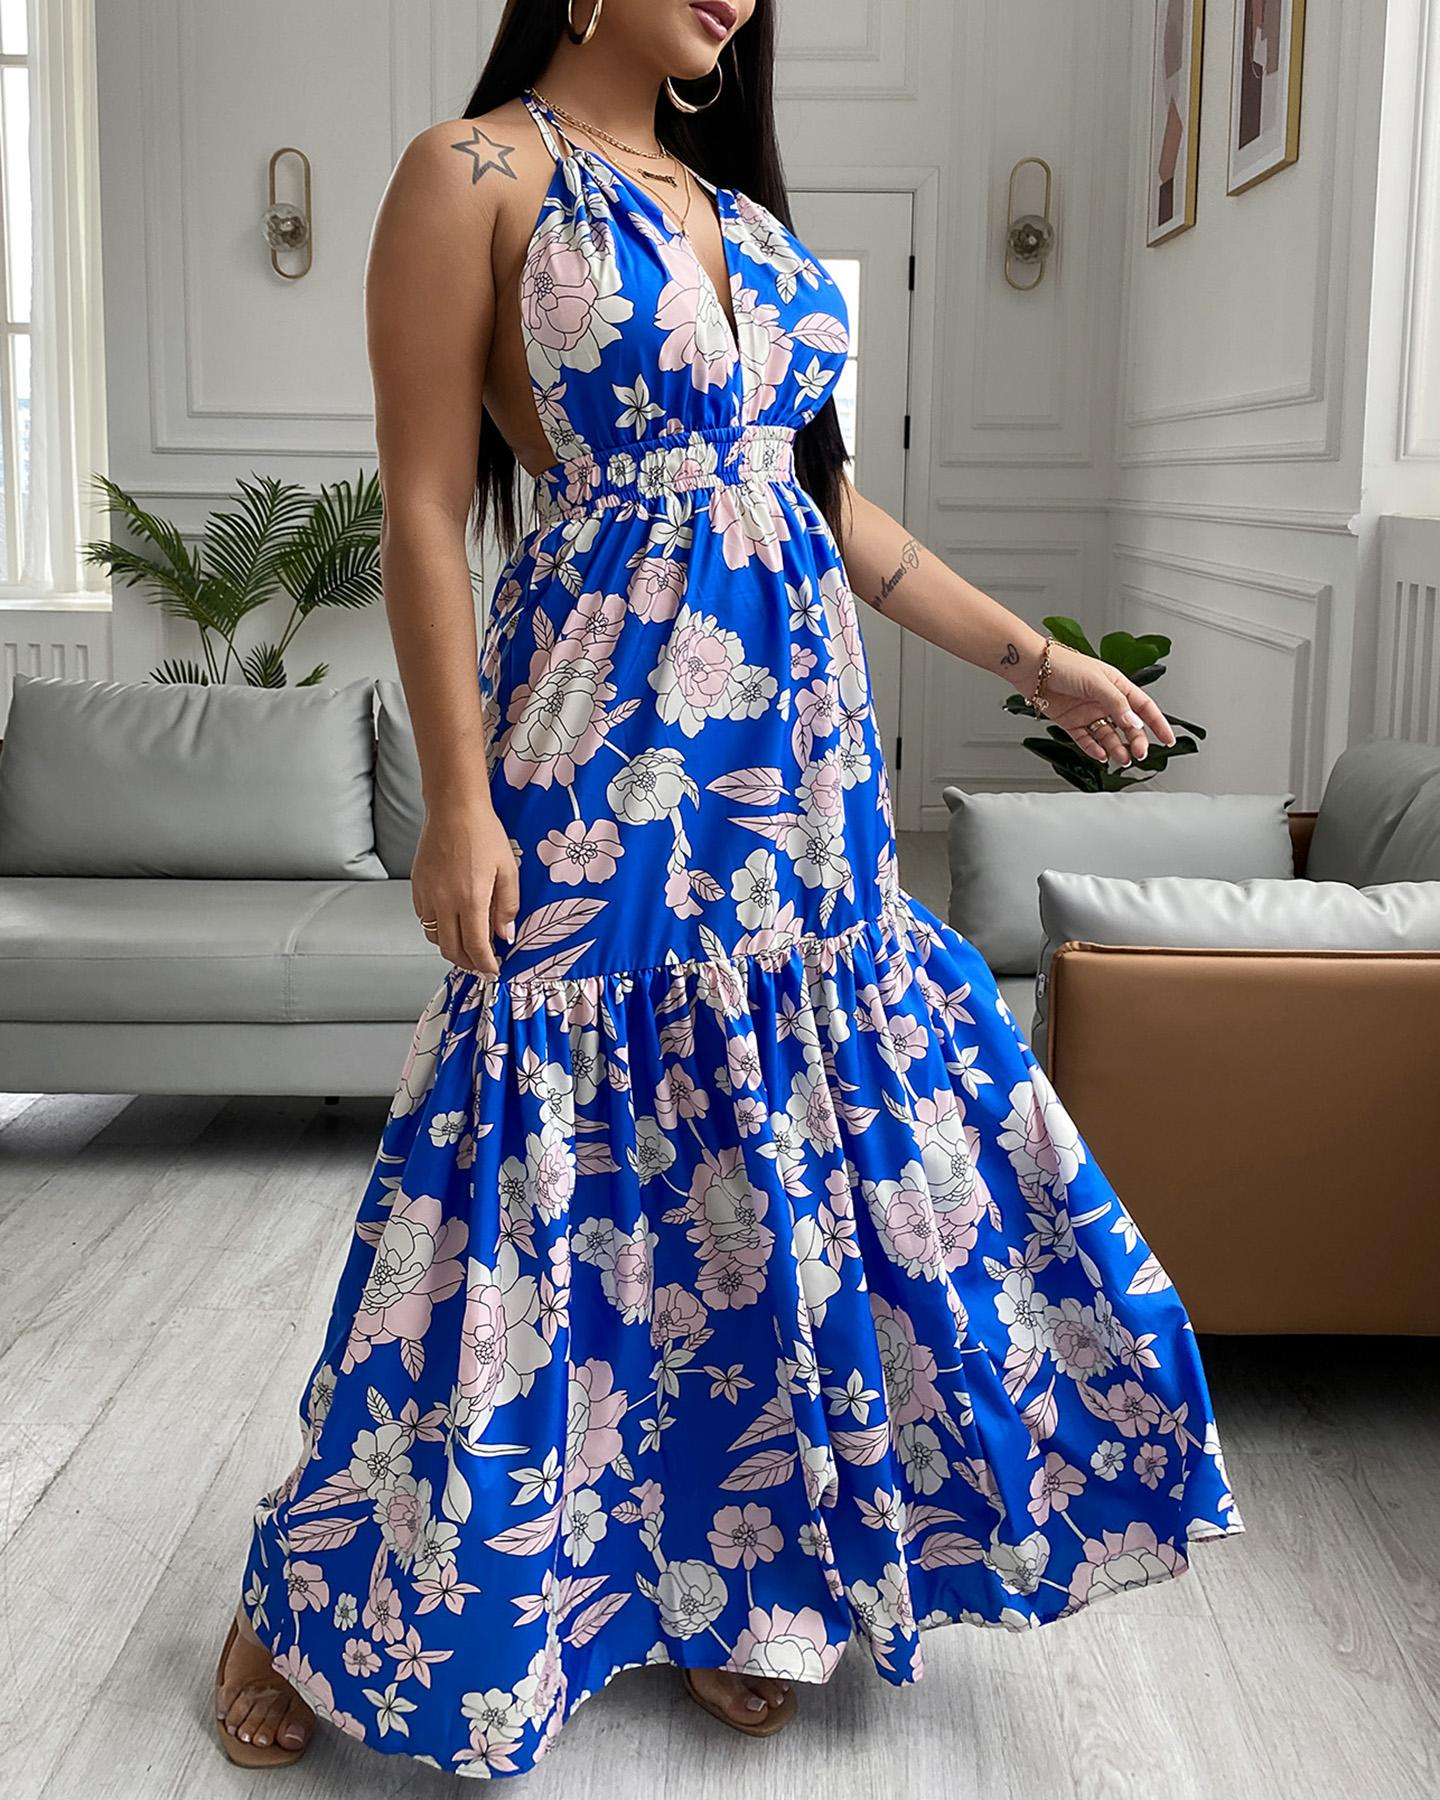 Floral Print Halter Backless Maxi Dress